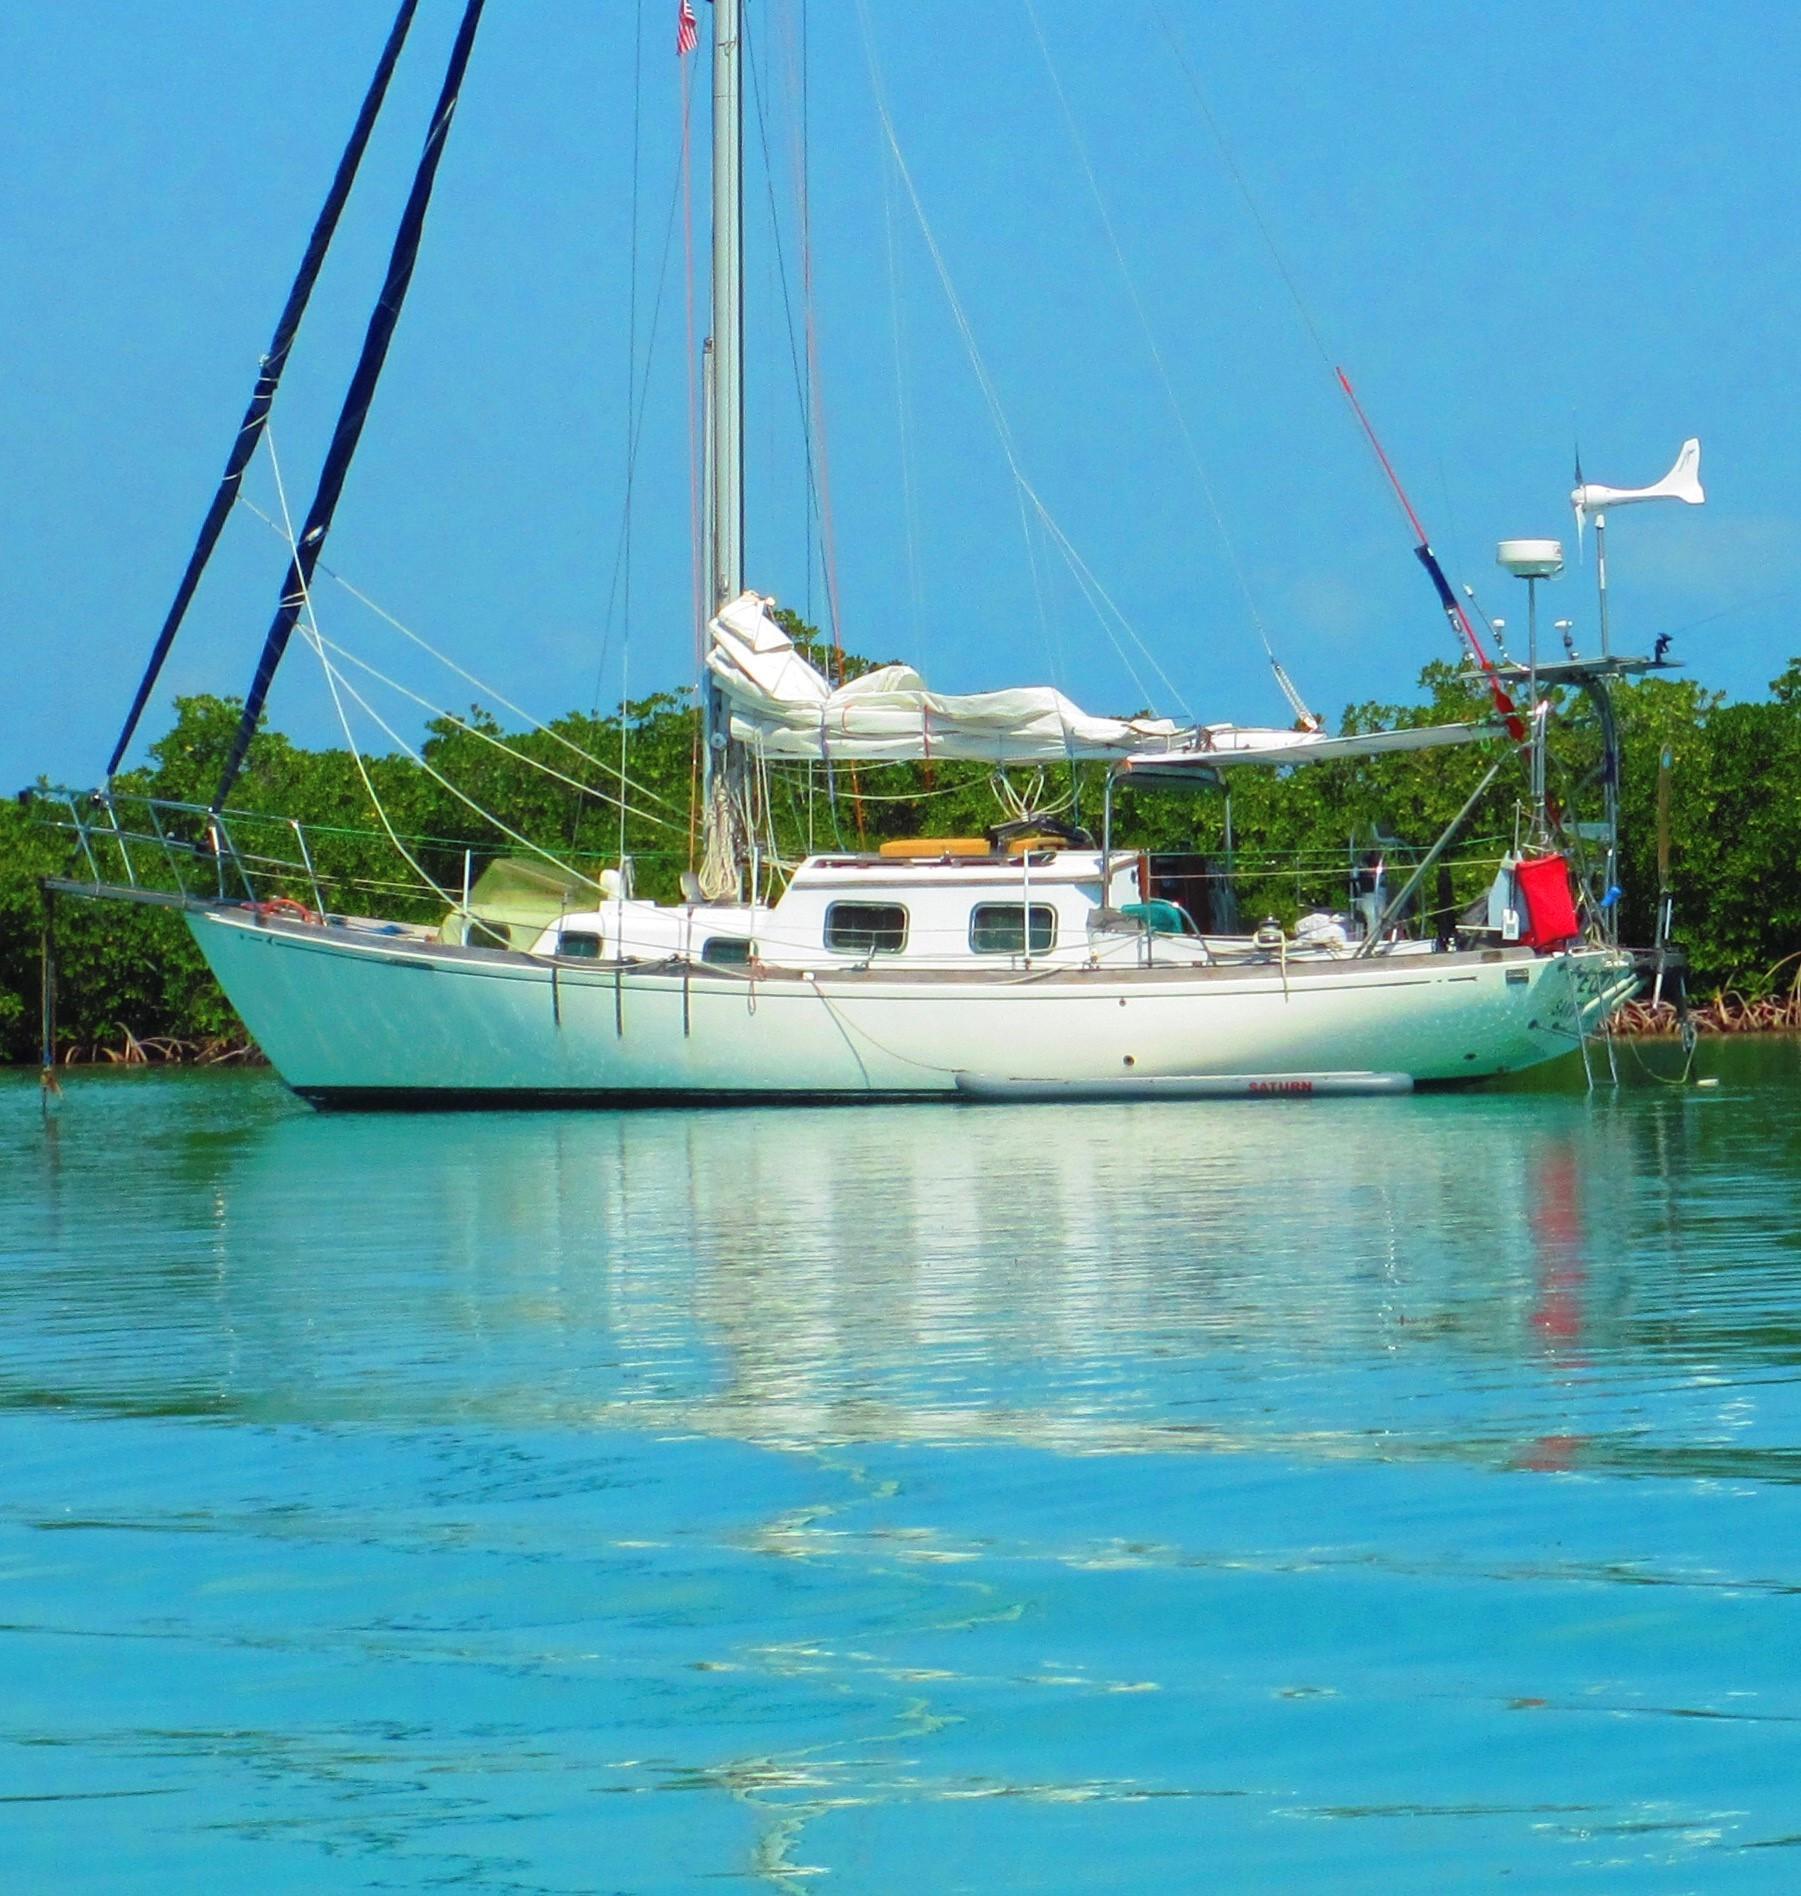 36' Seafarer Rhodes 36 Sloop 1971 No Hurricane Damage--Confirmed